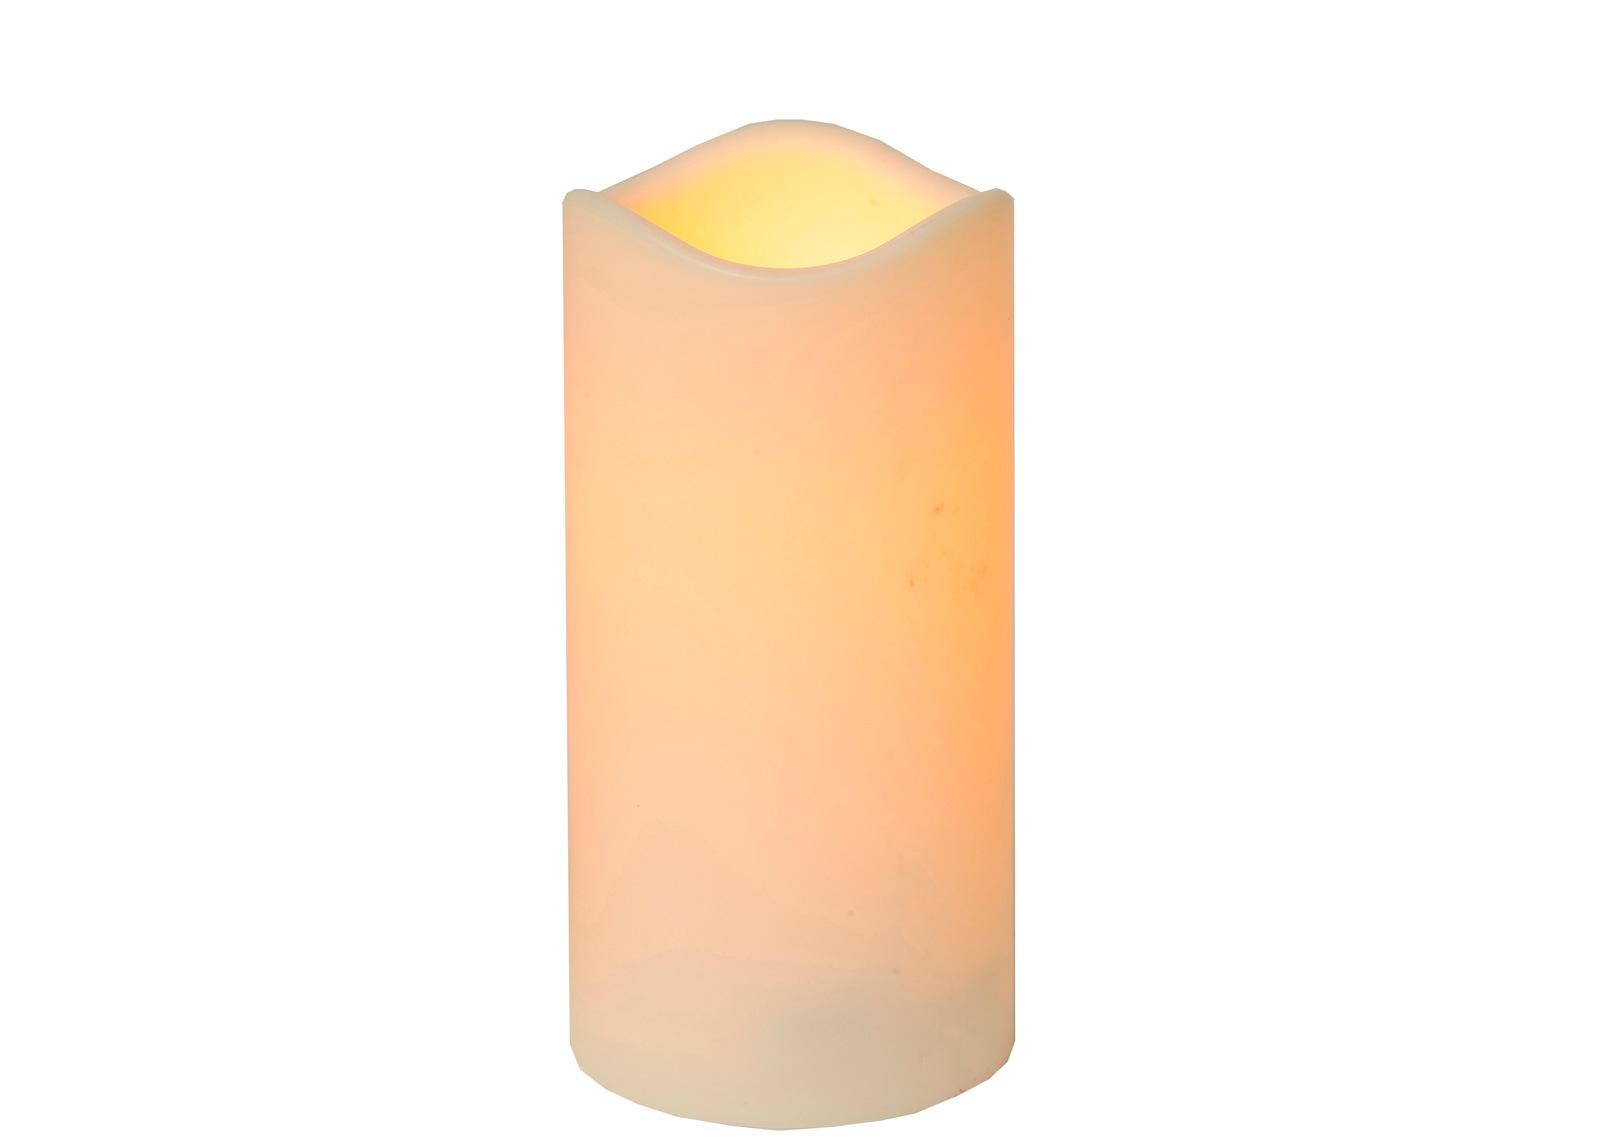 LED kynttilä ajastimella 15 cm